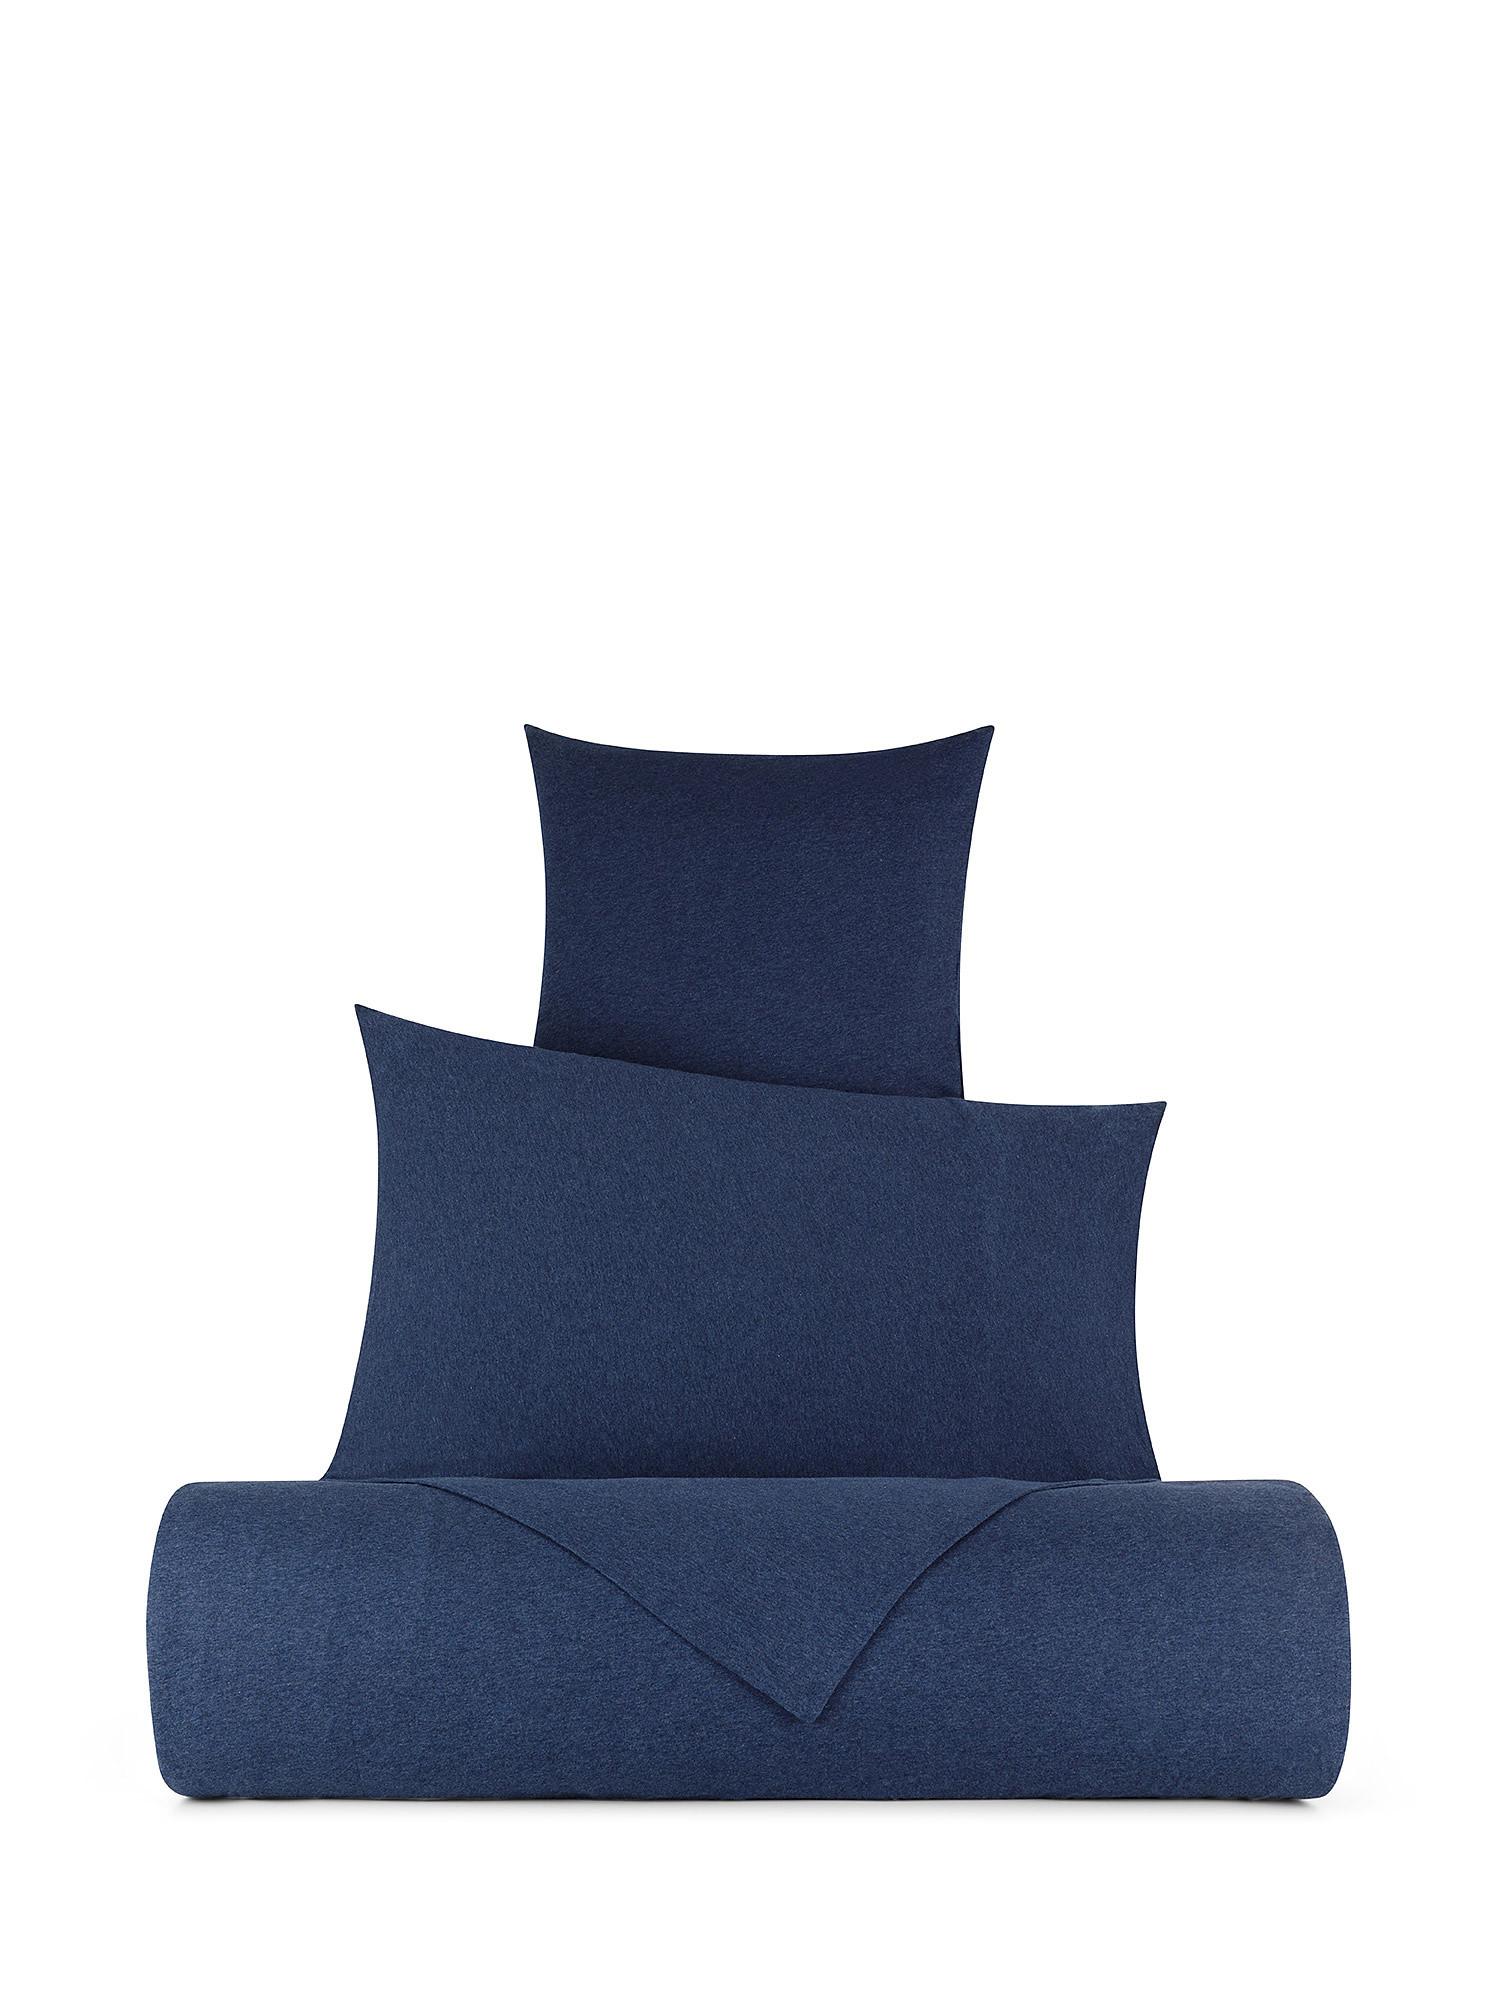 Parure copripiumino jersey di cotone tinta unita, Blu, large image number 0